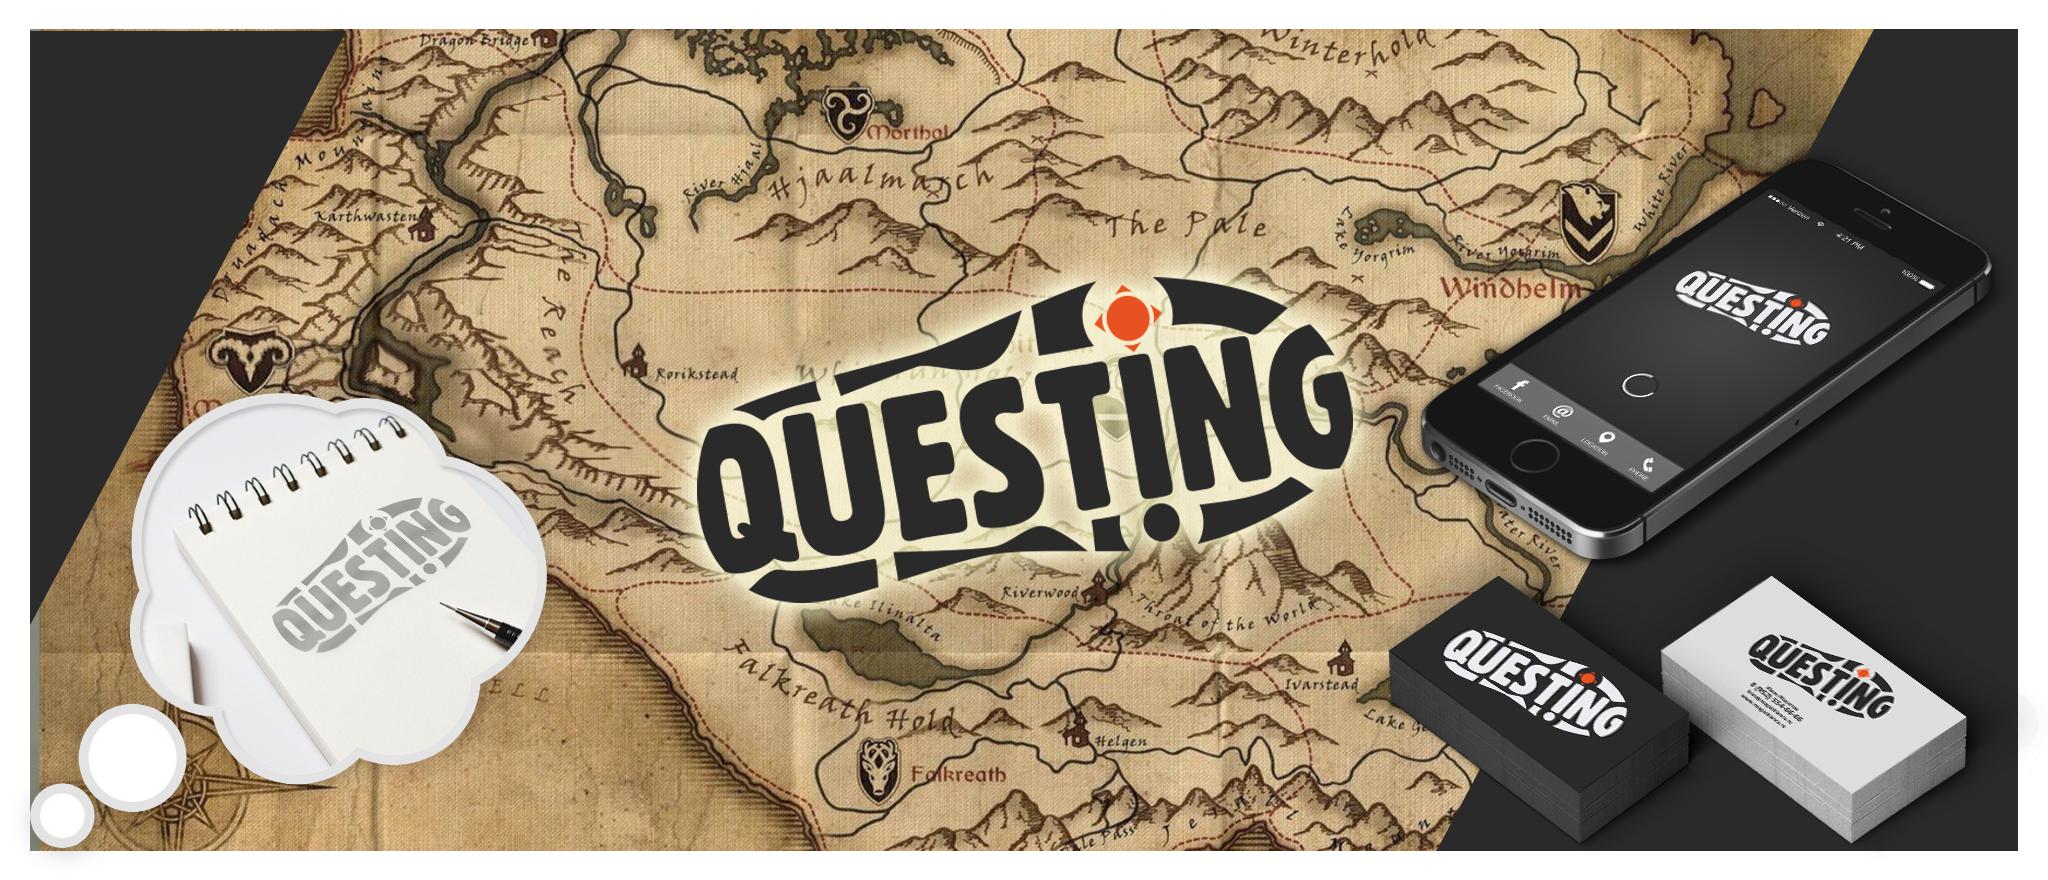 Questing - 1-ое место в конкурсе